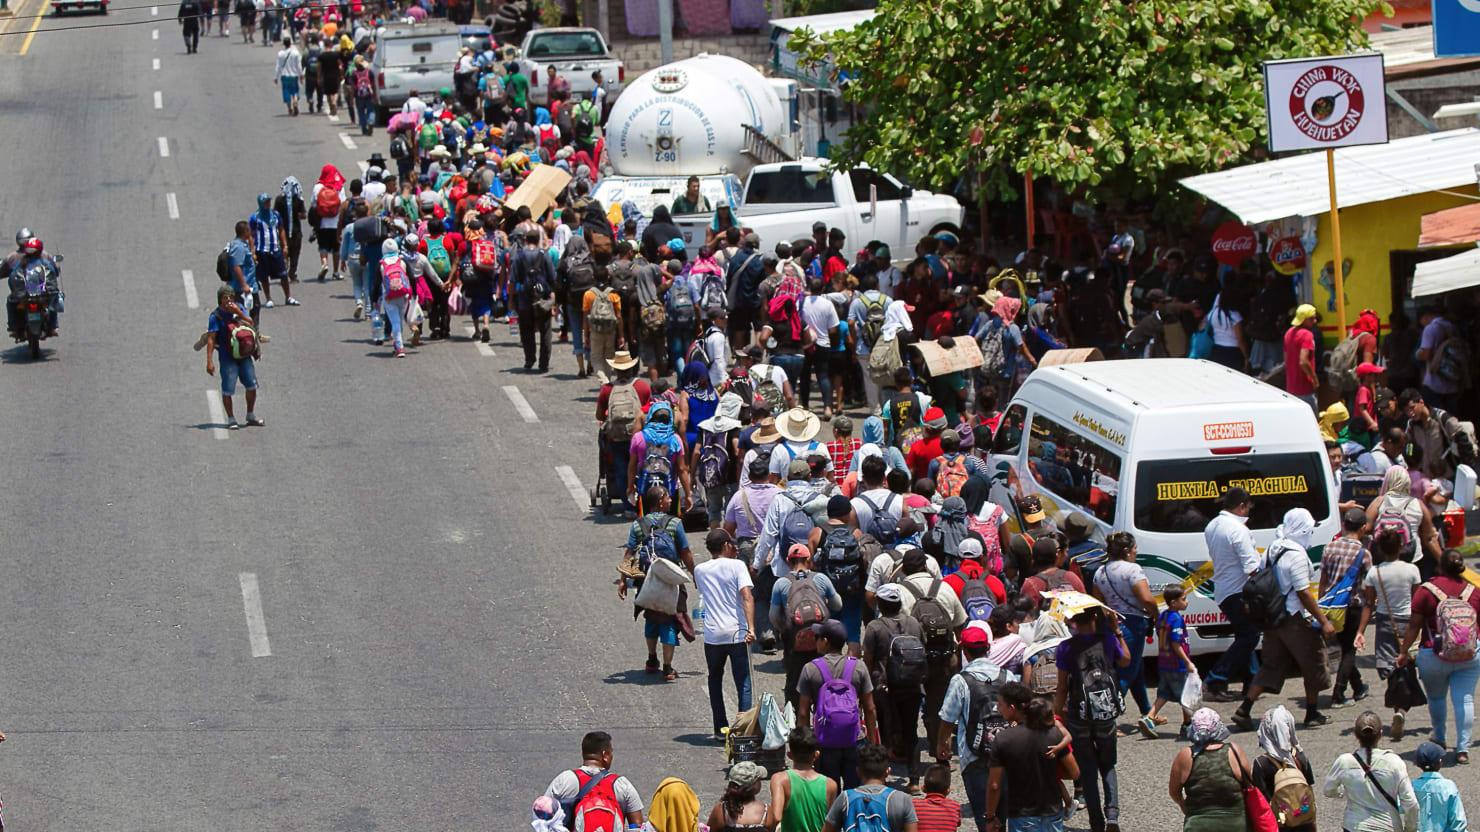 Migrant Caravan: Mexican Authorities Detain Hundreds in Raid